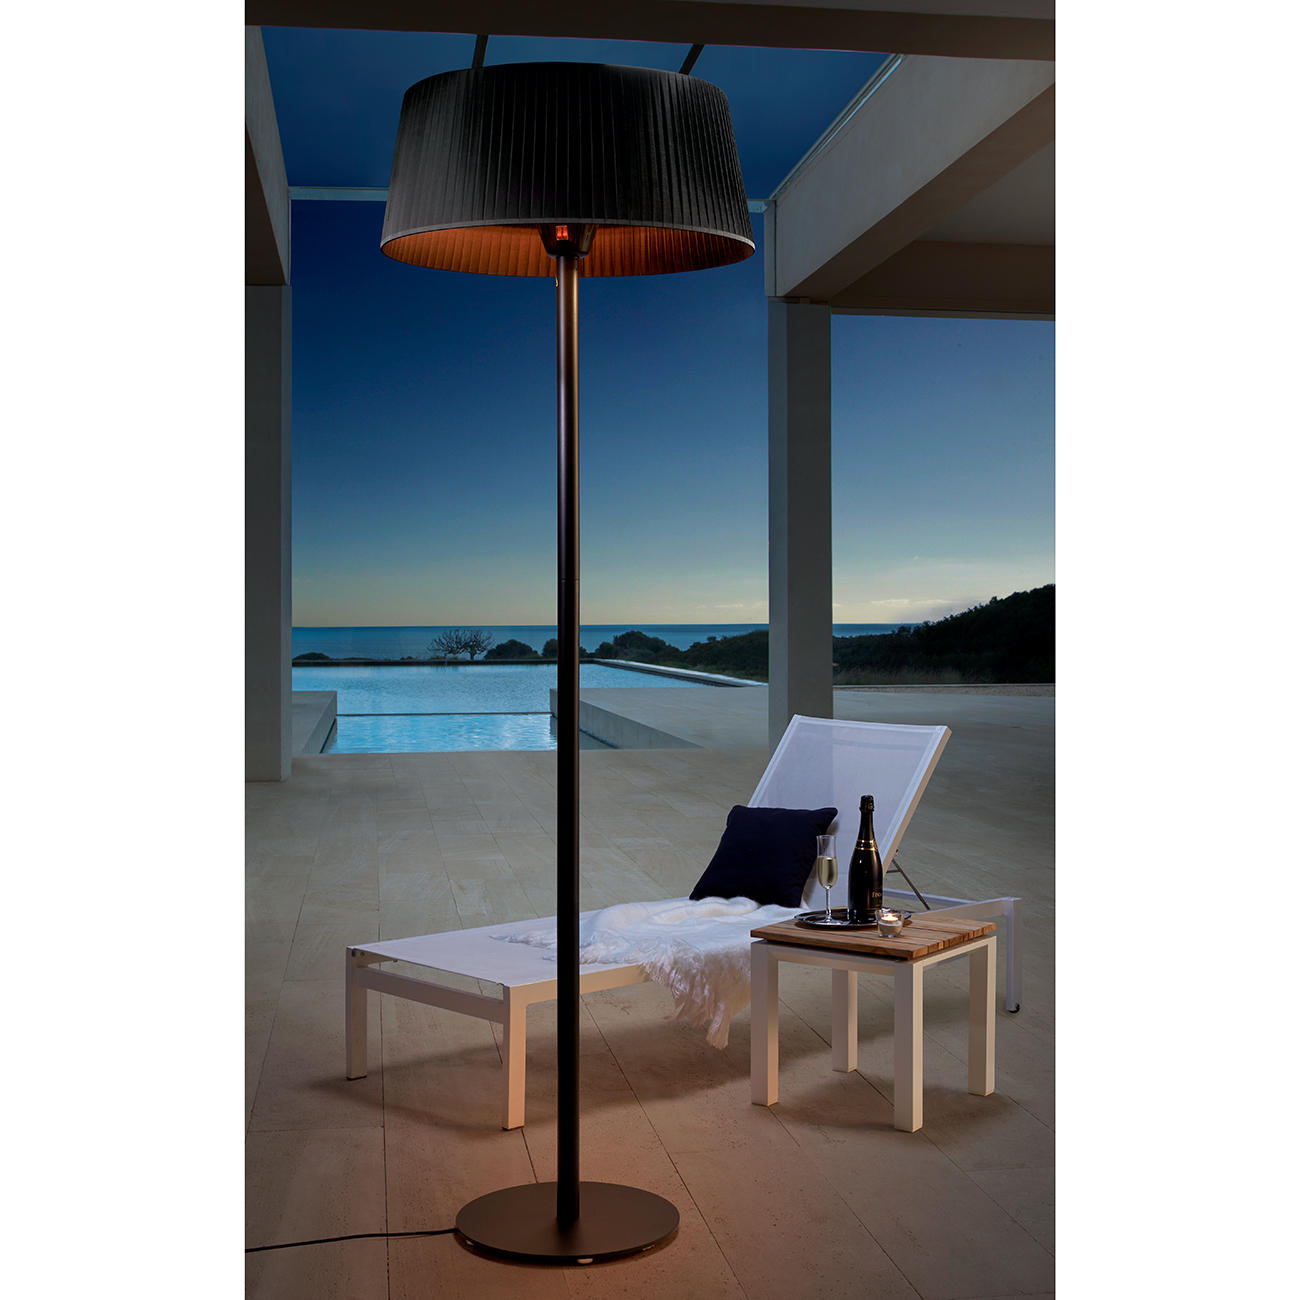 stlamper design amazing stehleuchte papier schwarz stehlampe with stlamper design amazing. Black Bedroom Furniture Sets. Home Design Ideas